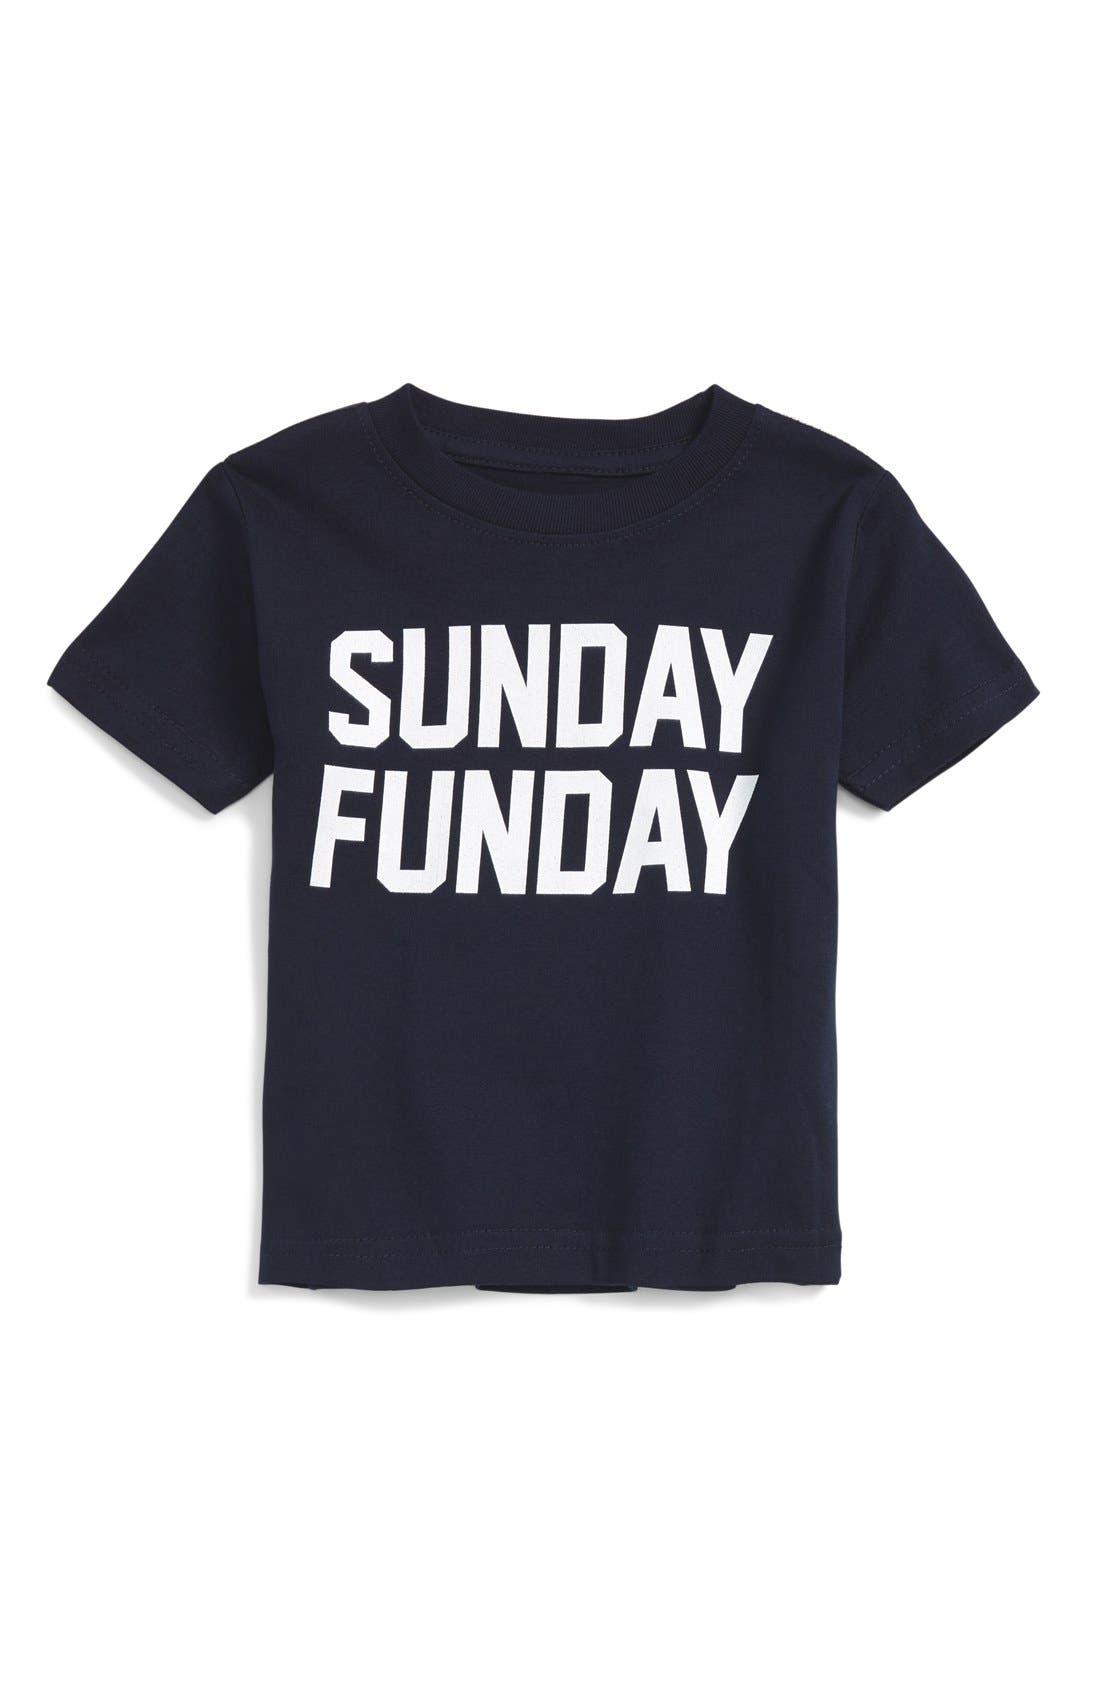 Kid Dangerous 'Sunday Funday' Graphic T-Shirt (Baby)